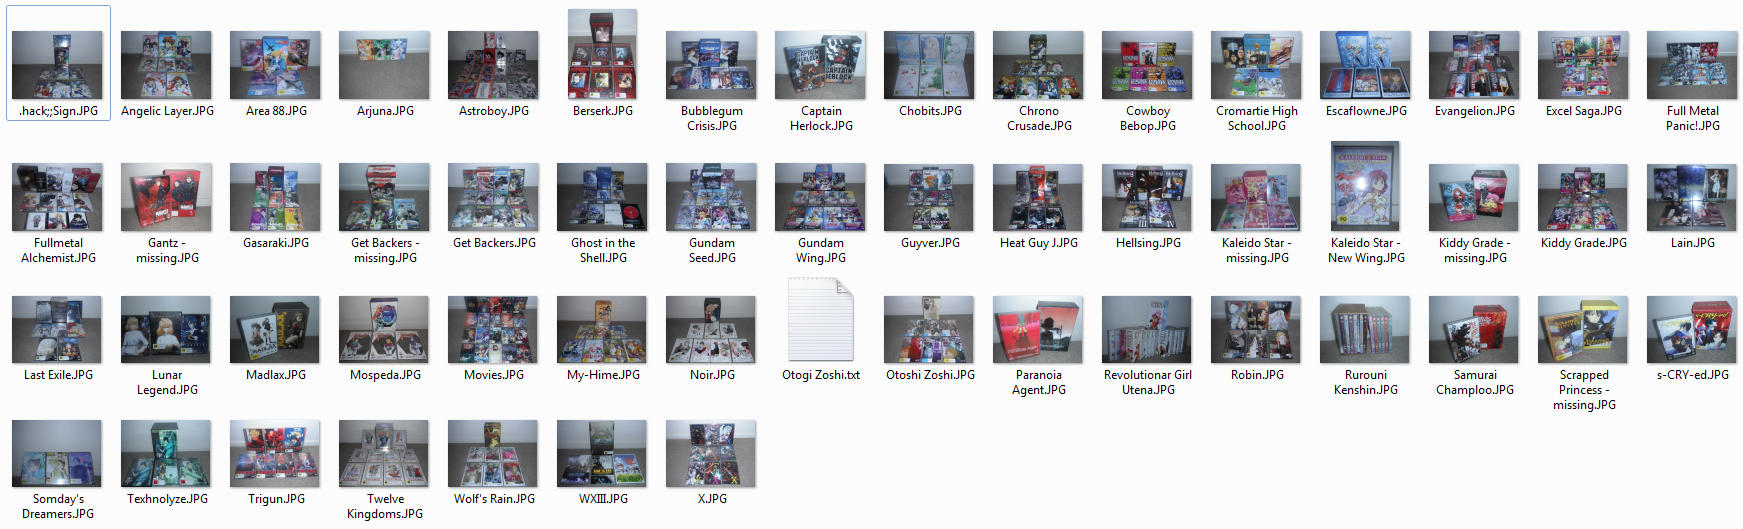 [Seller] Heaps of Assorted Anime DVDs Screenshot-2011-12-12_03.51.220004